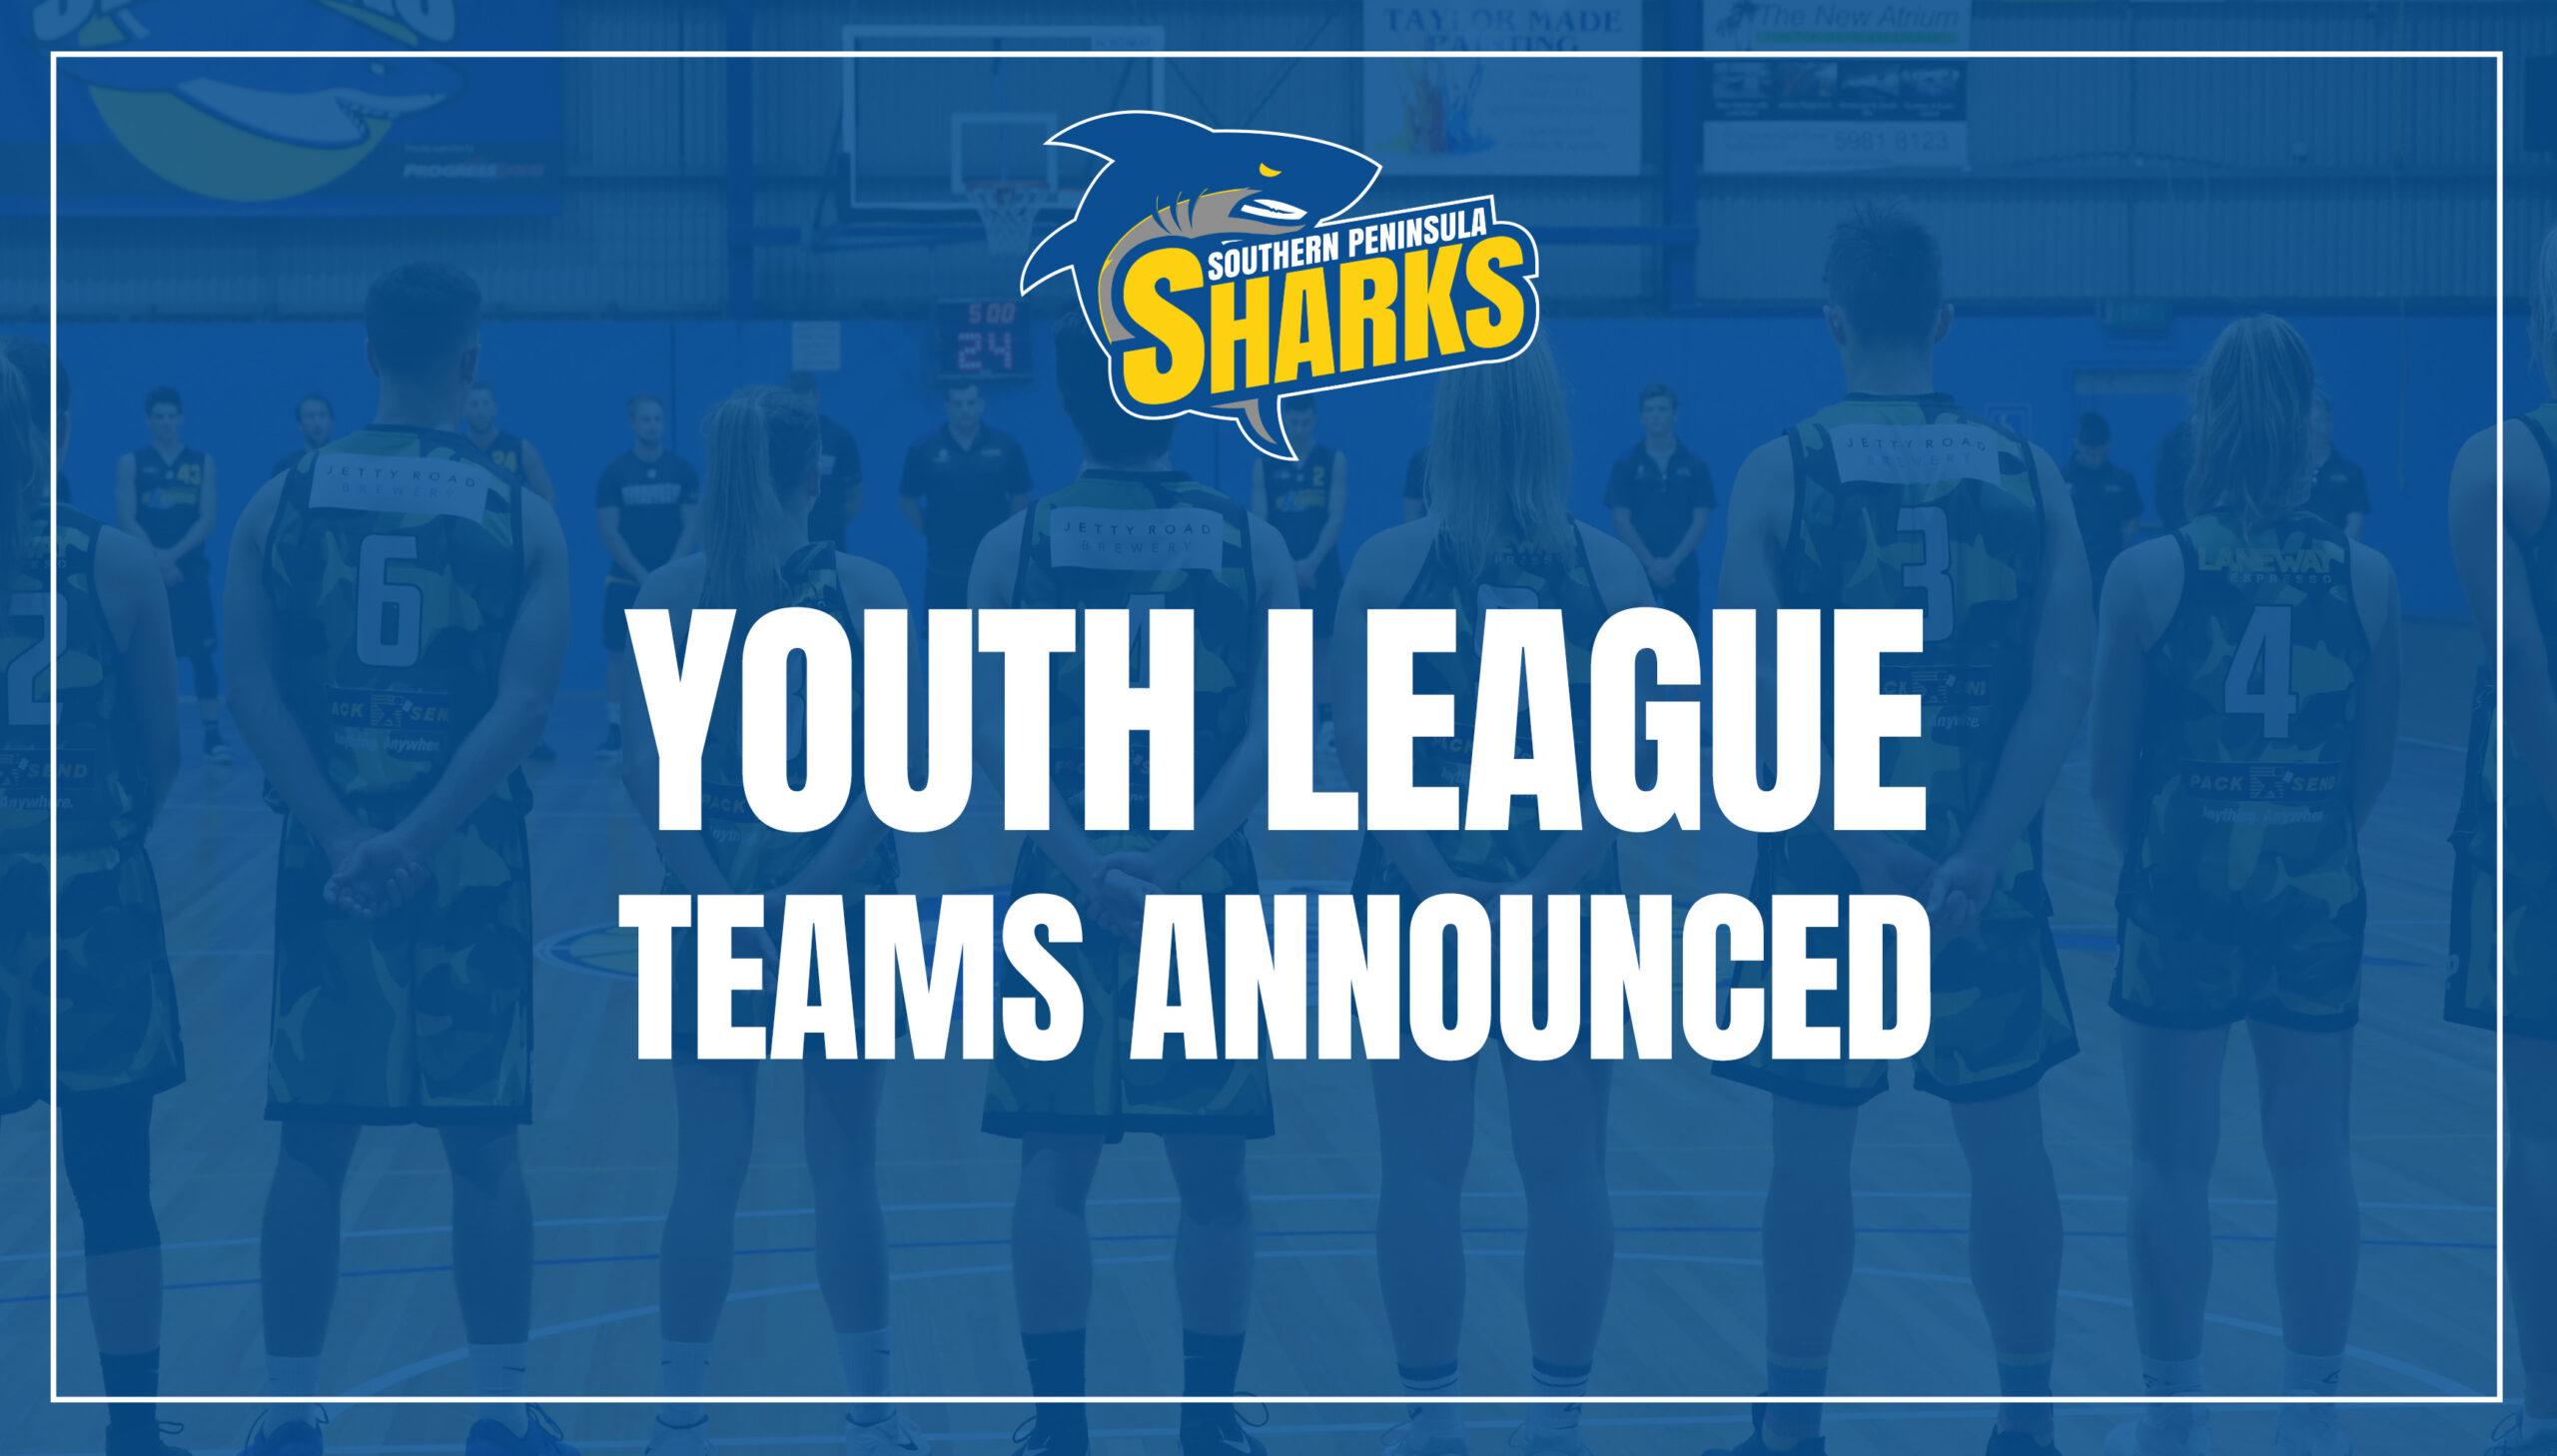 Youth Leauge Teams